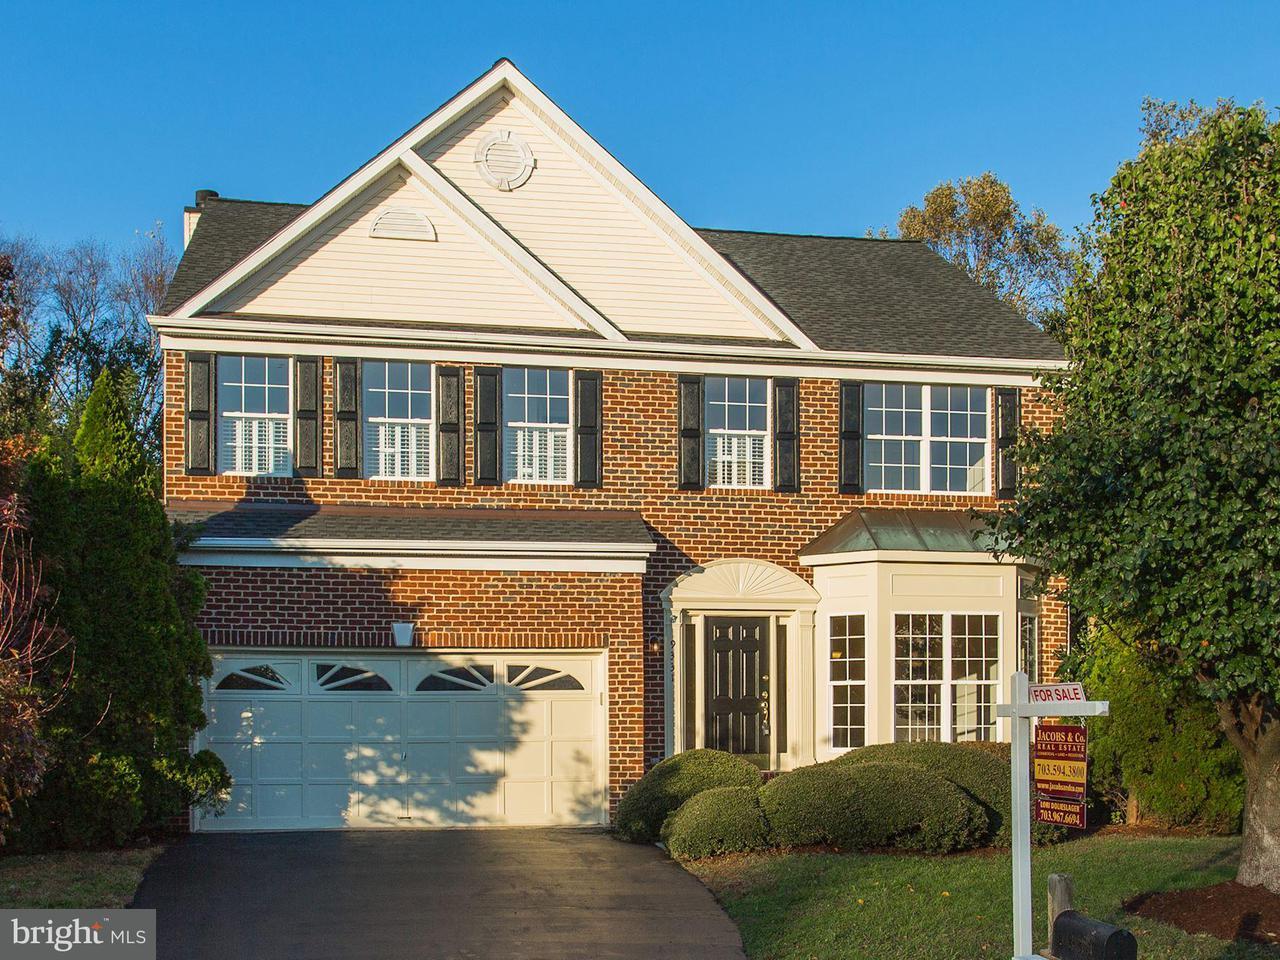 Single Family Home for Sale at 9331 BRANDON Street 9331 BRANDON Street Manassas Park, Virginia 20111 United States